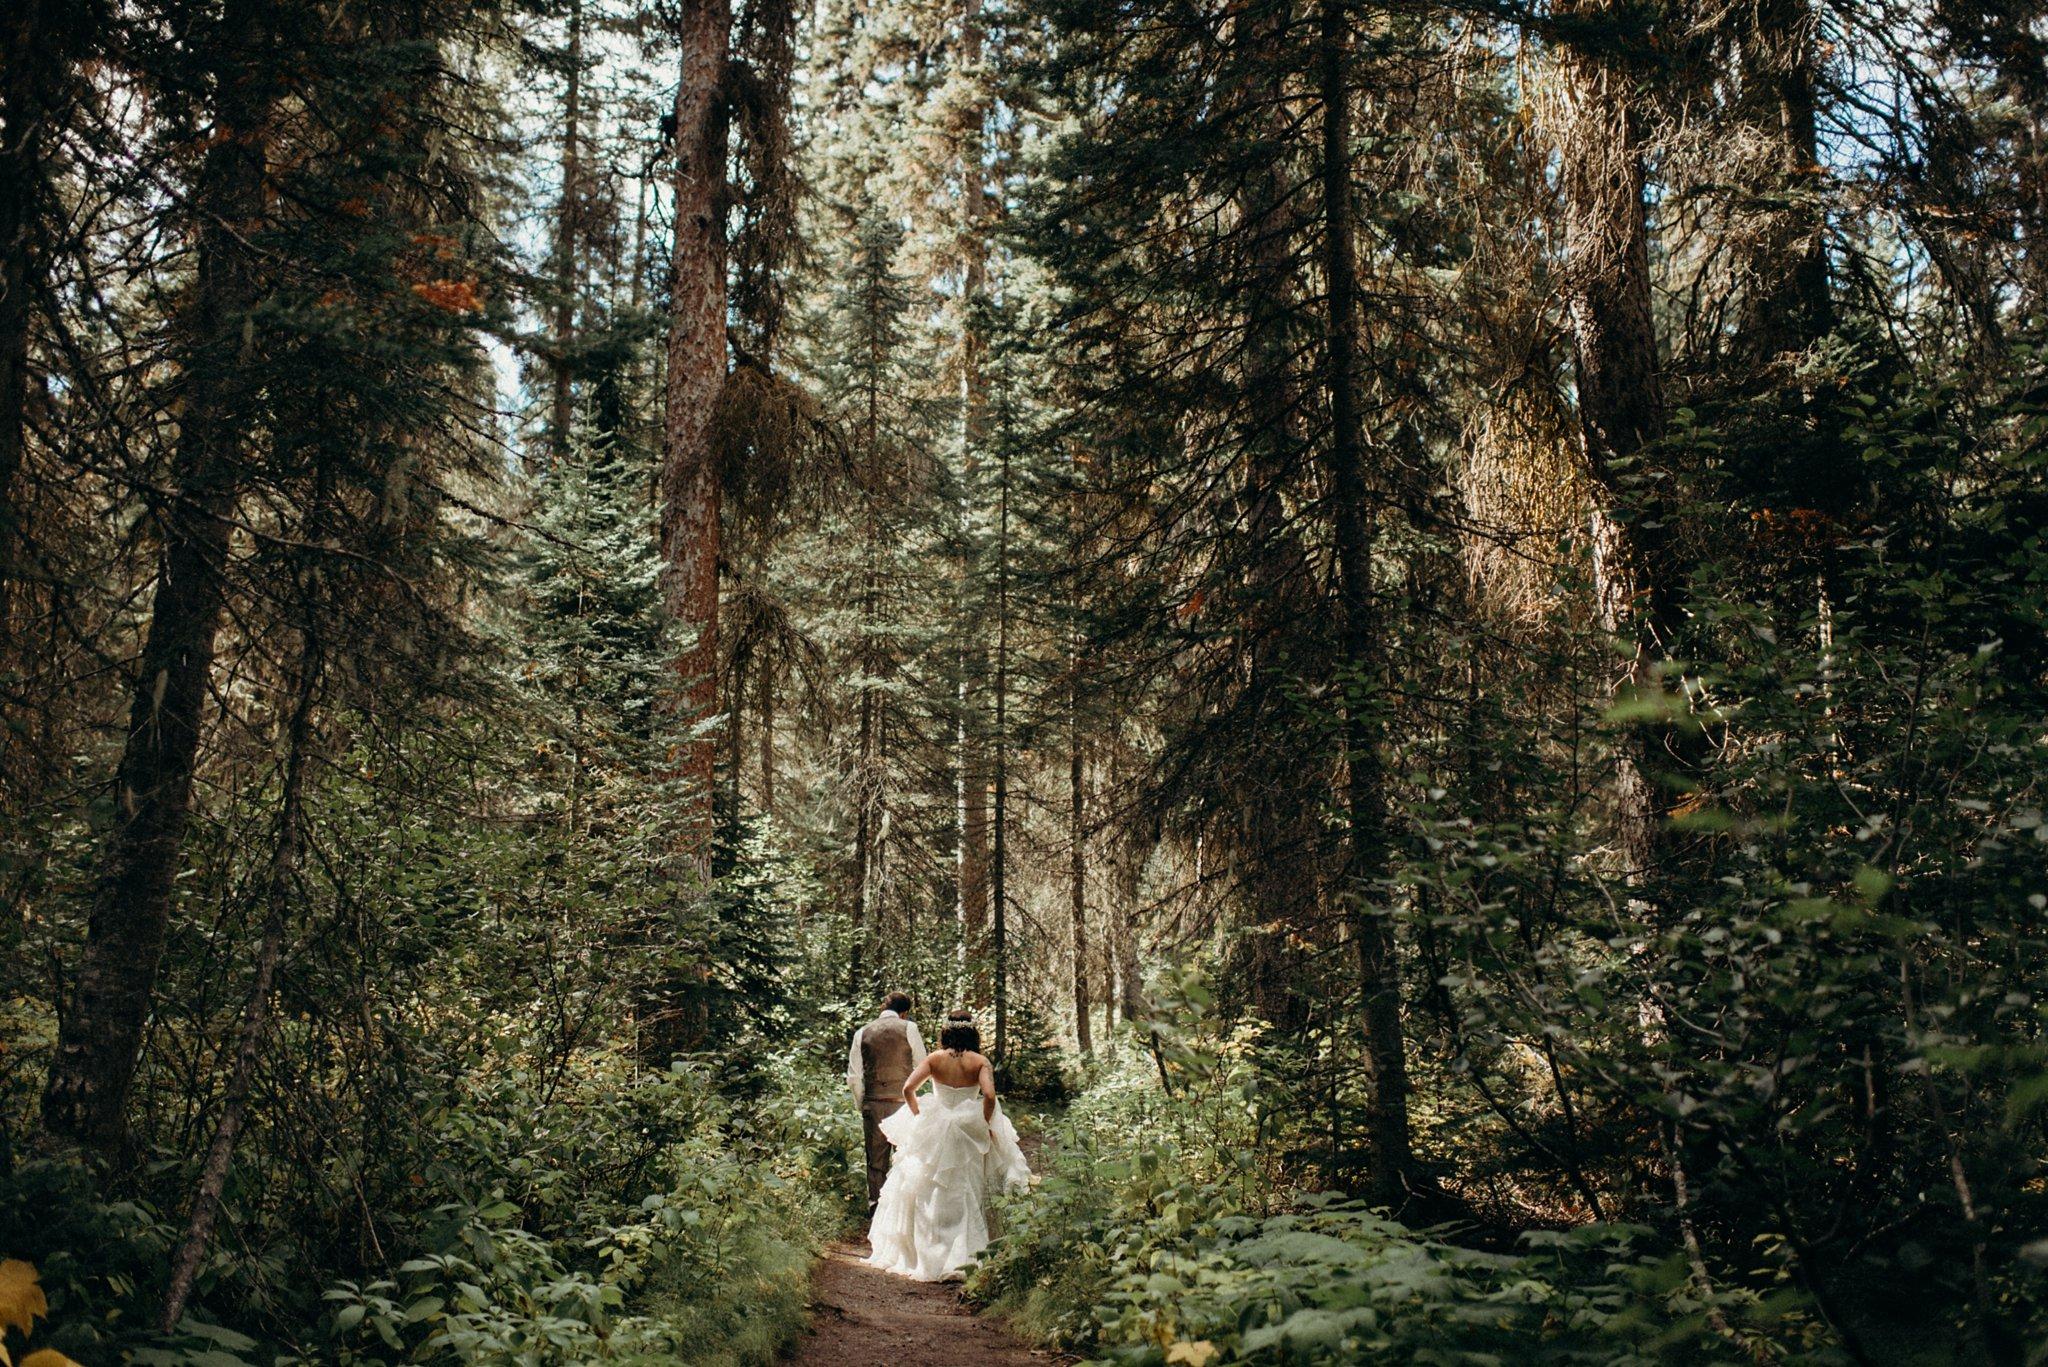 kaihla_tonai_intimate_wedding_elopement_photographer_6890.jpg